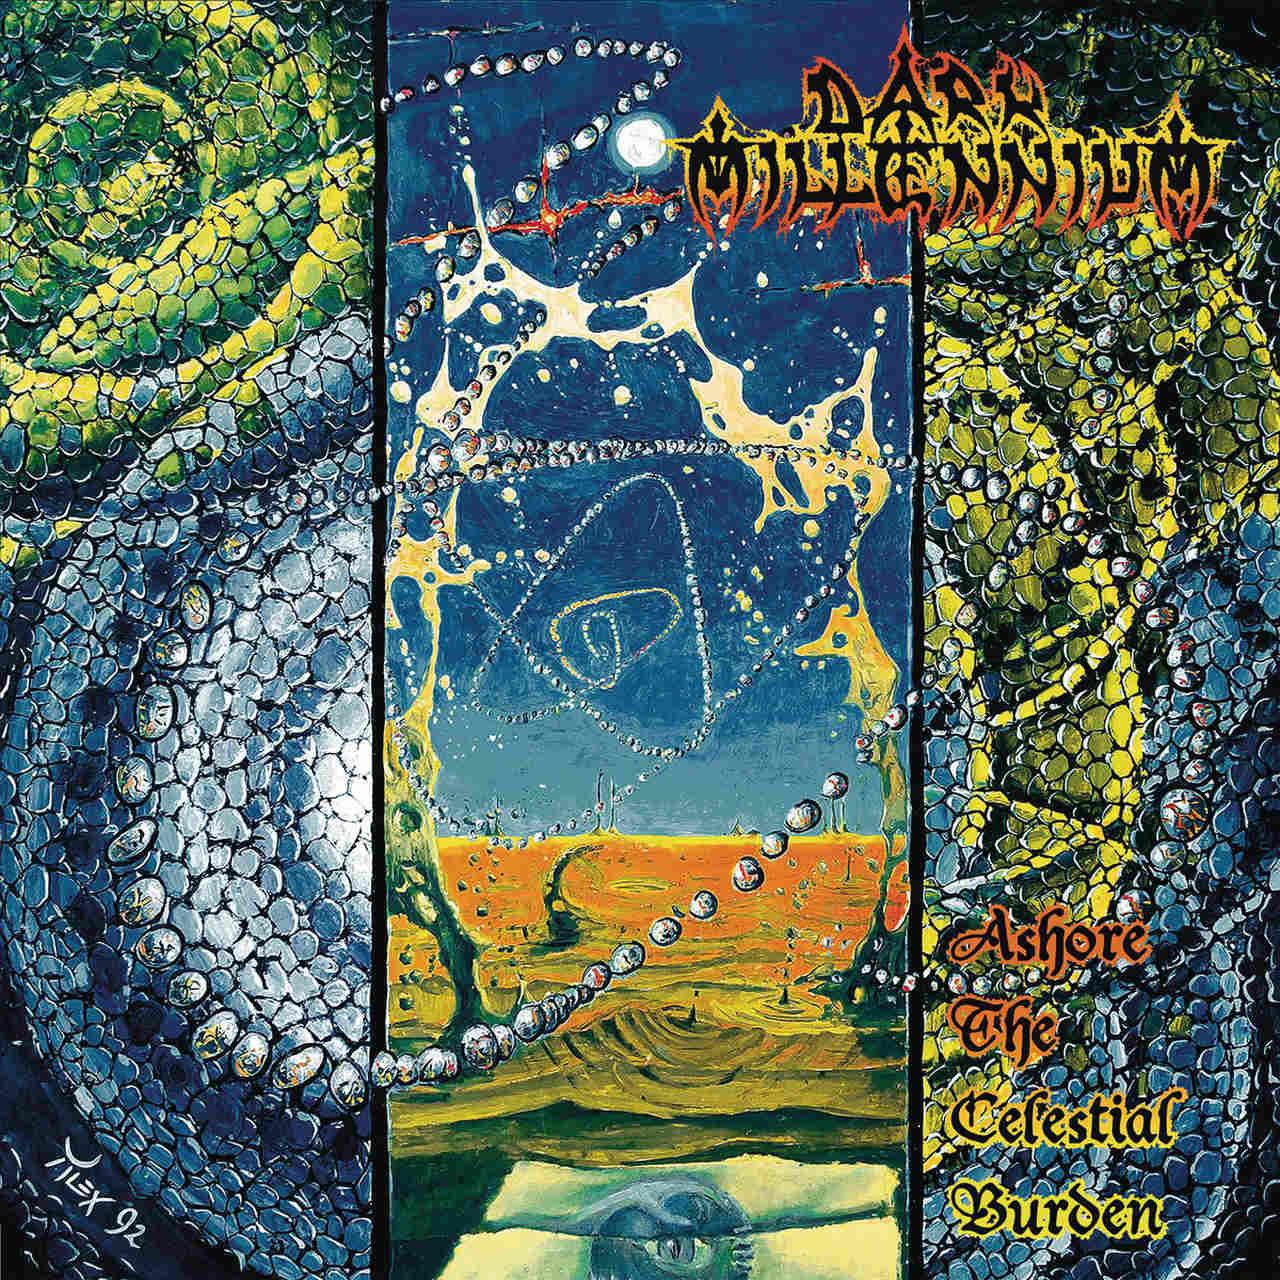 Dark Millennium - Ashore the Celestial Burden